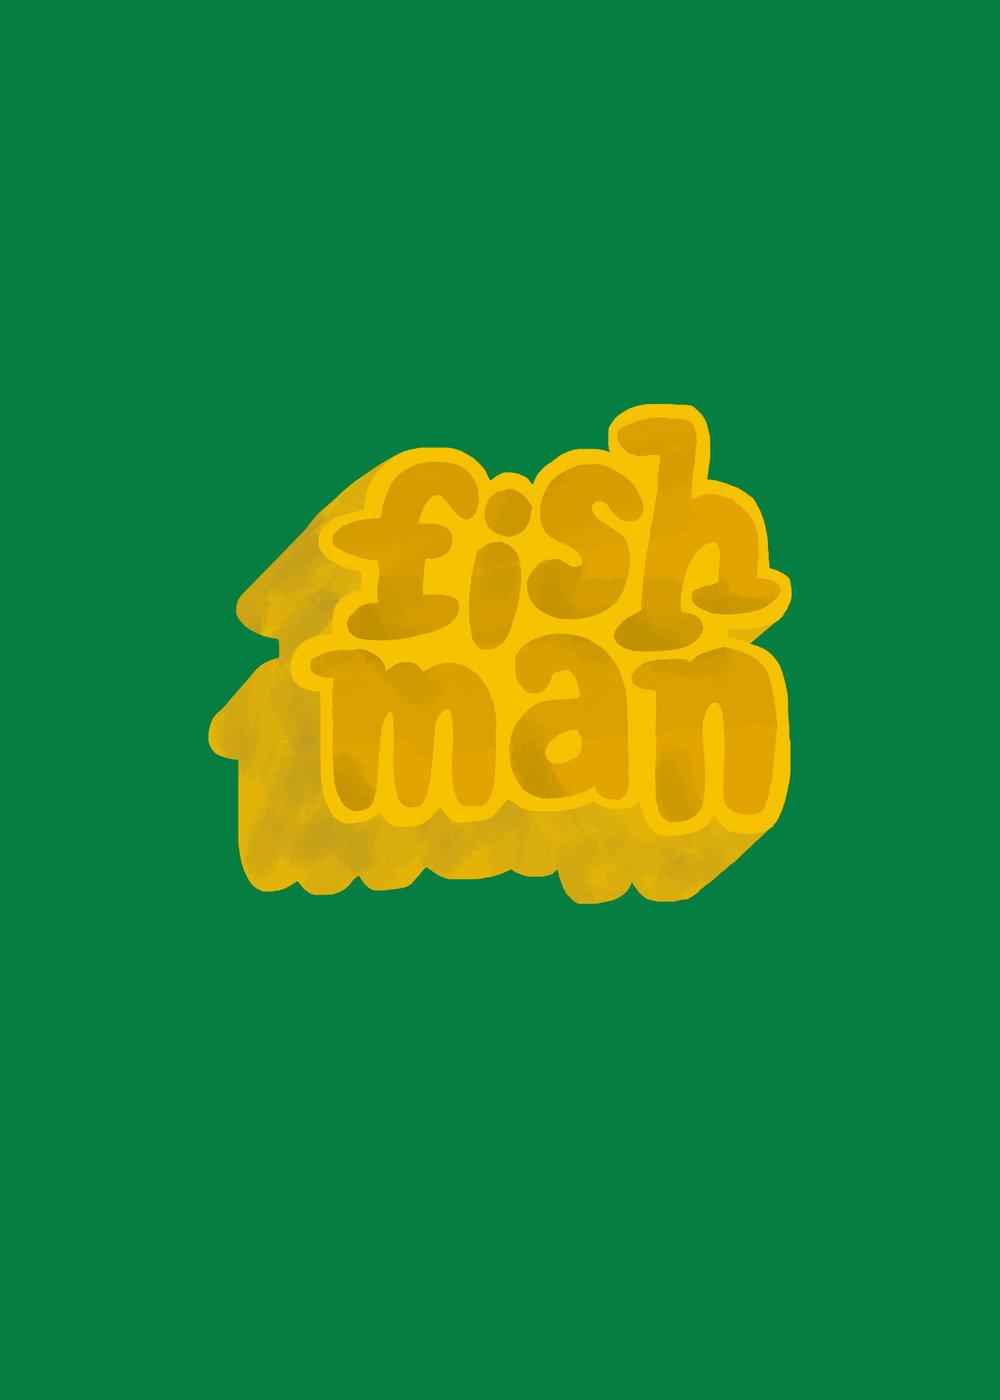 9.Fishman.jpg